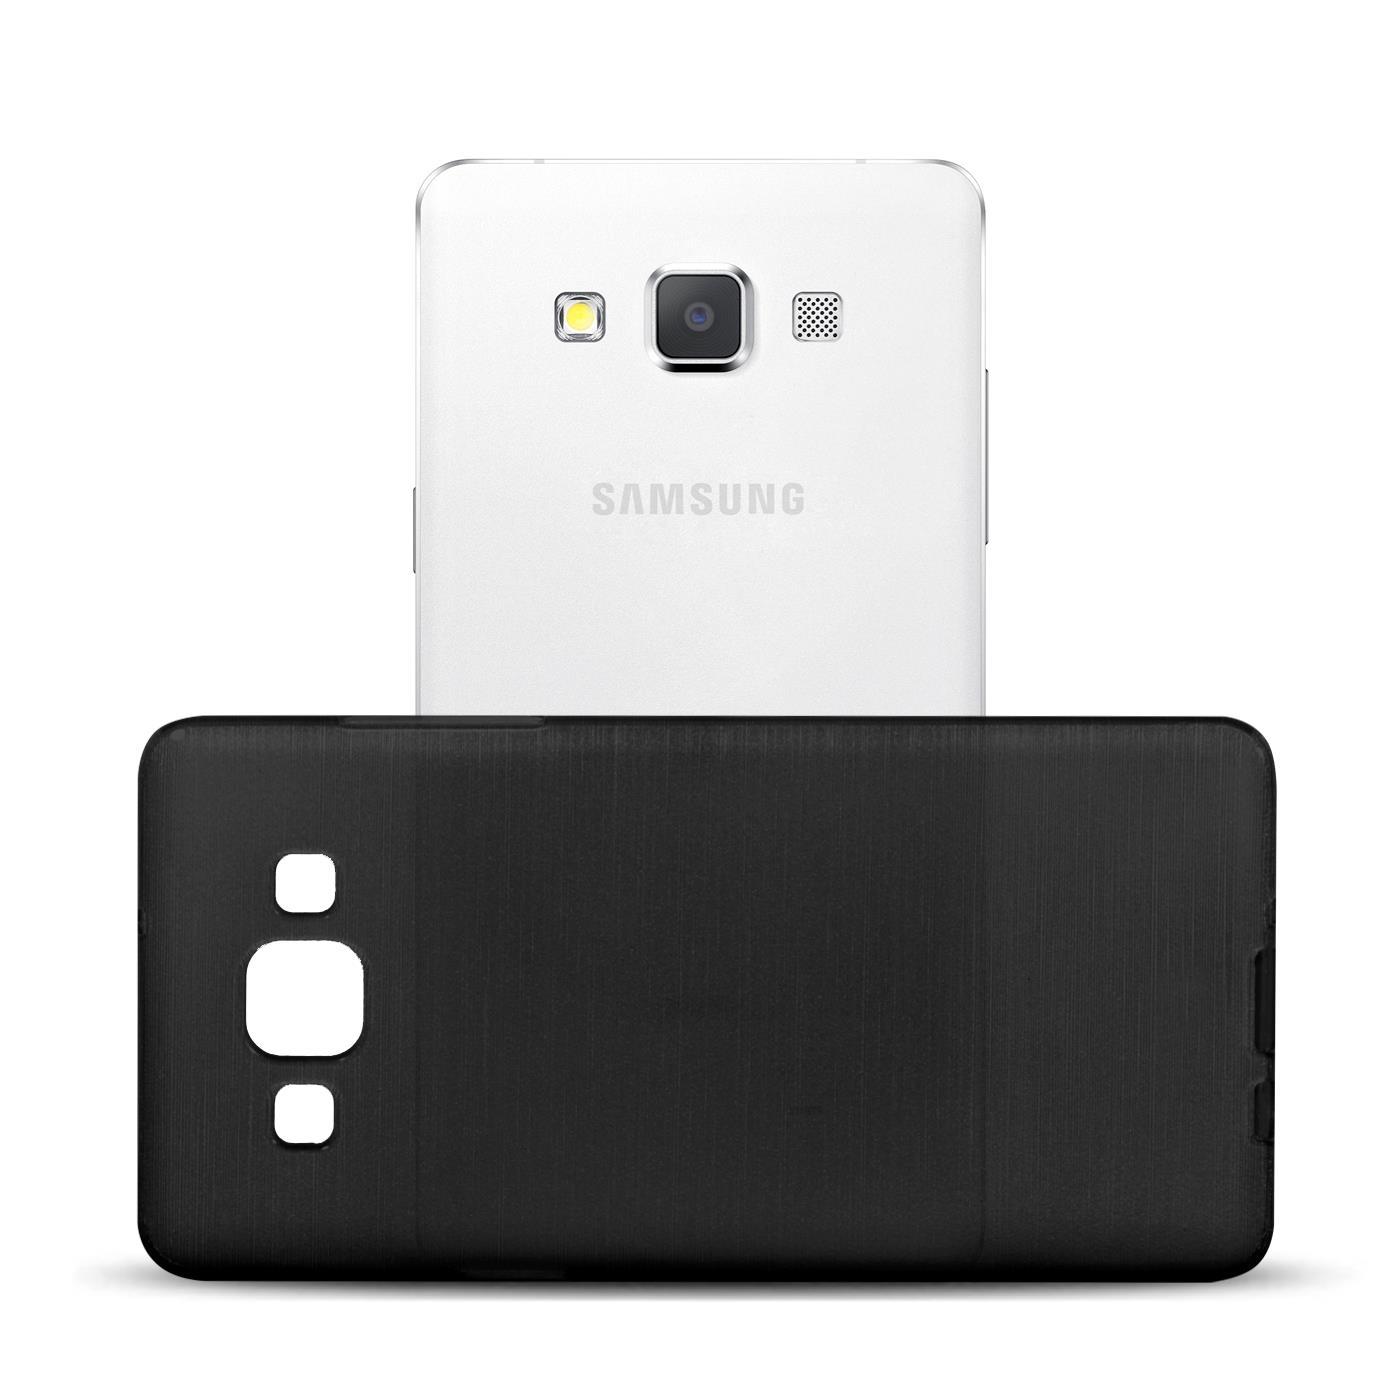 Silikon-Bumper-Case-Samsung-Galaxy-a5-2015-Ultra-Slim-Stossfeste-Rueckschale Indexbild 20